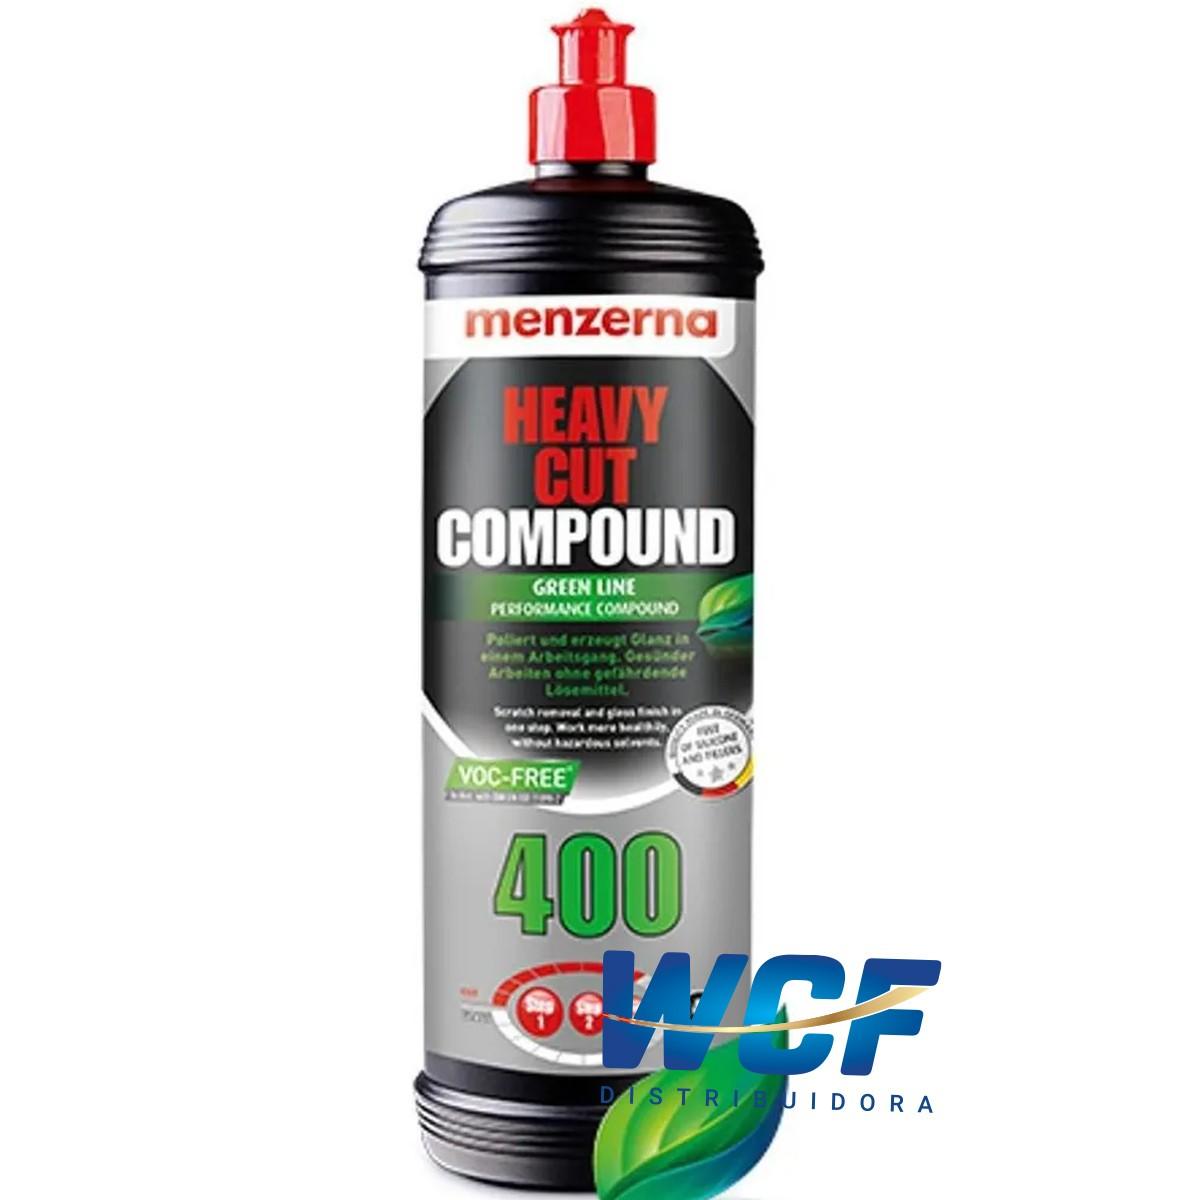 HEAVY CUT COMPOUND GREEN LINE PERFORMANCE 400 1LT MENZERNA